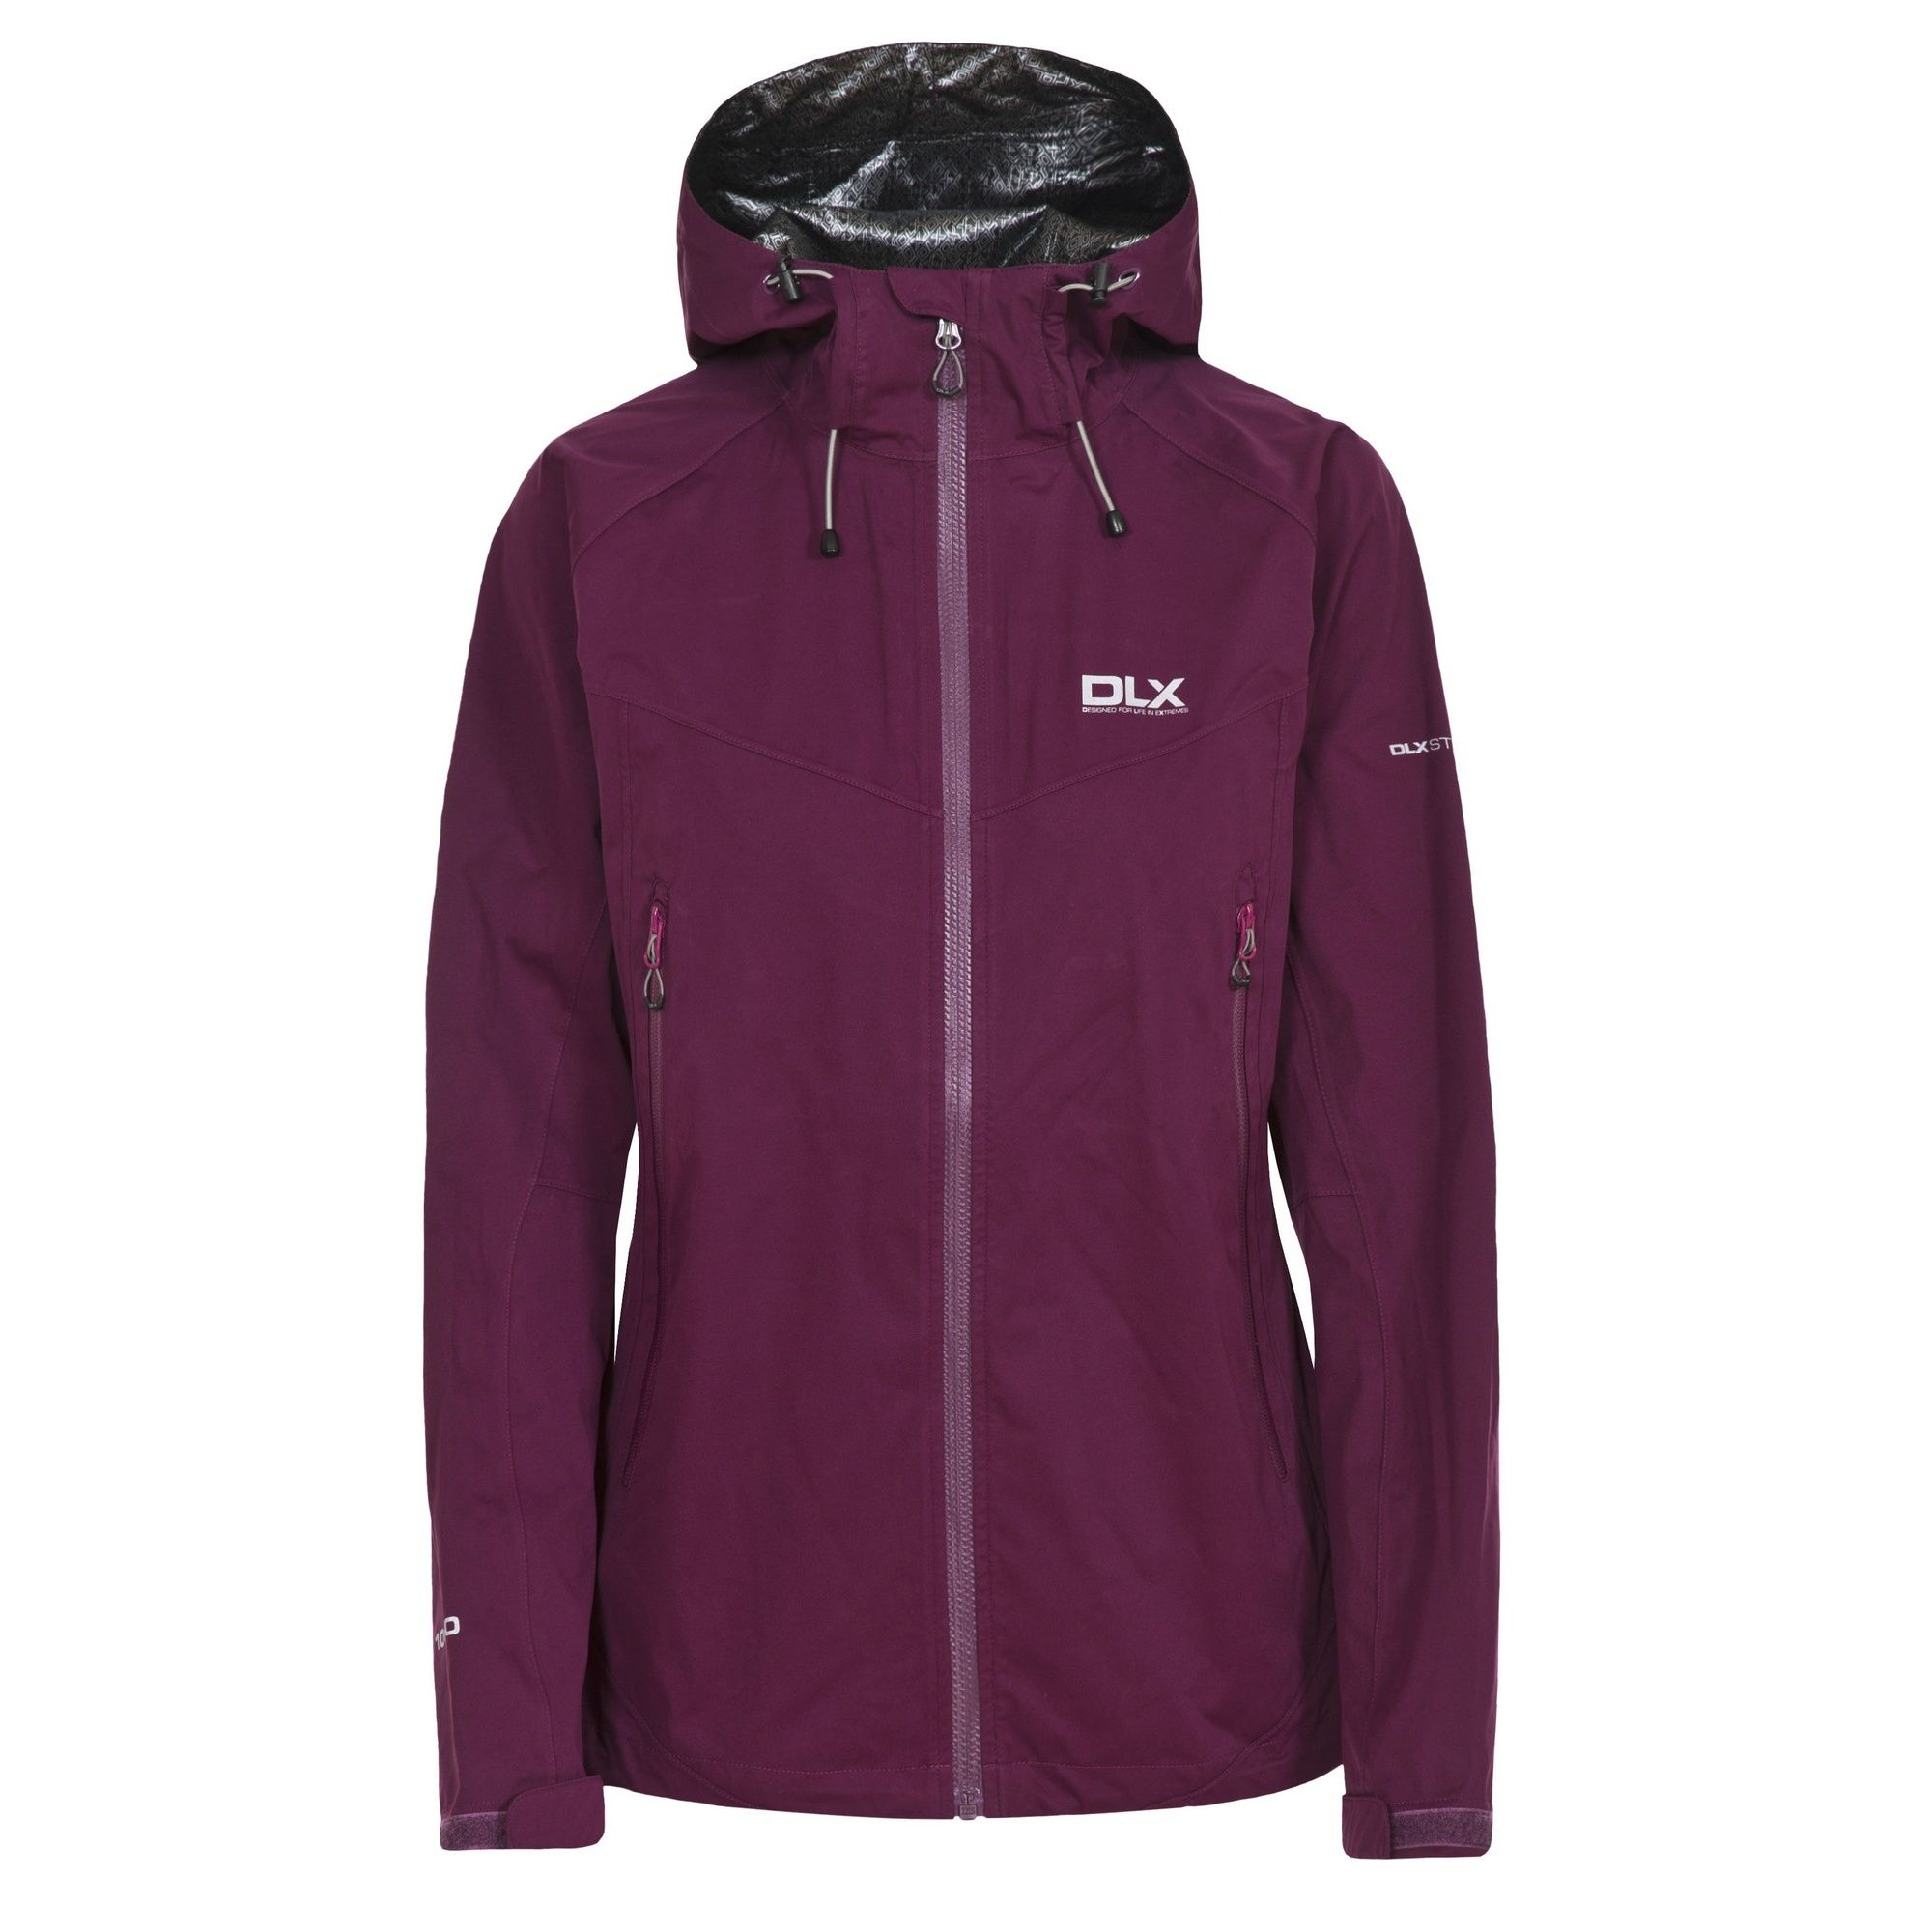 Trespass Womens/Ladies Erika II Waterproof DLX Jacket